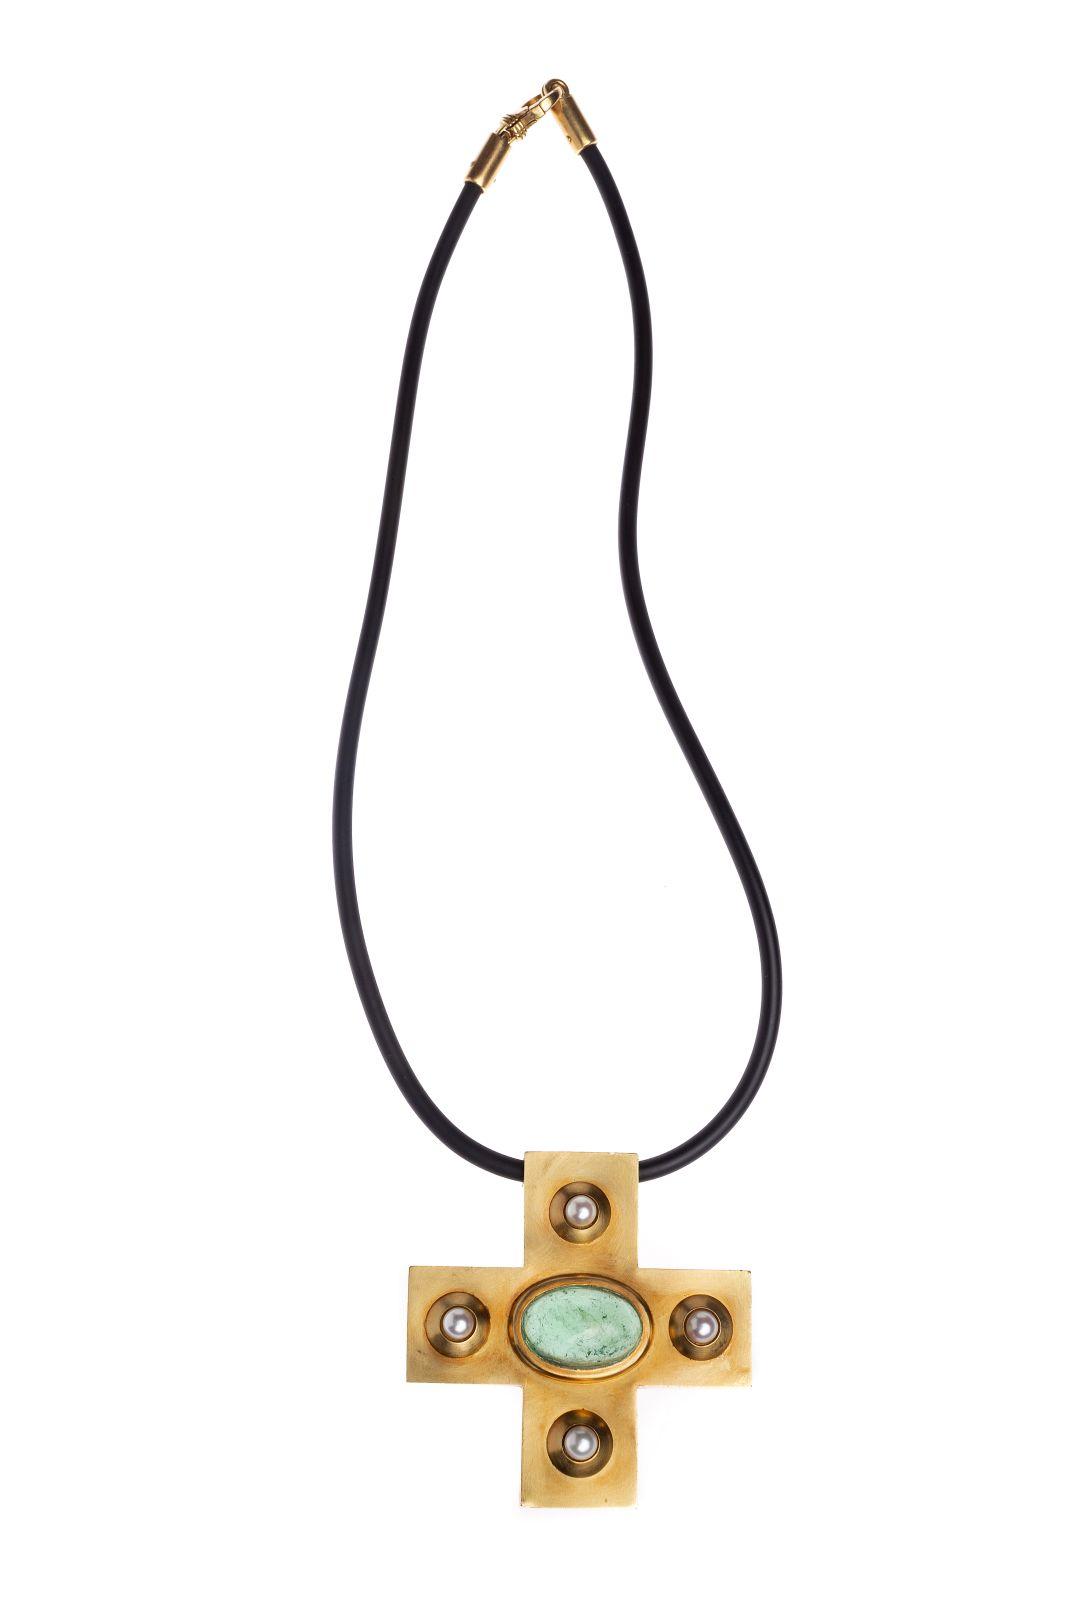 #129 Pendant in cross shape | Anhänger Kreuz Gelbgold Image